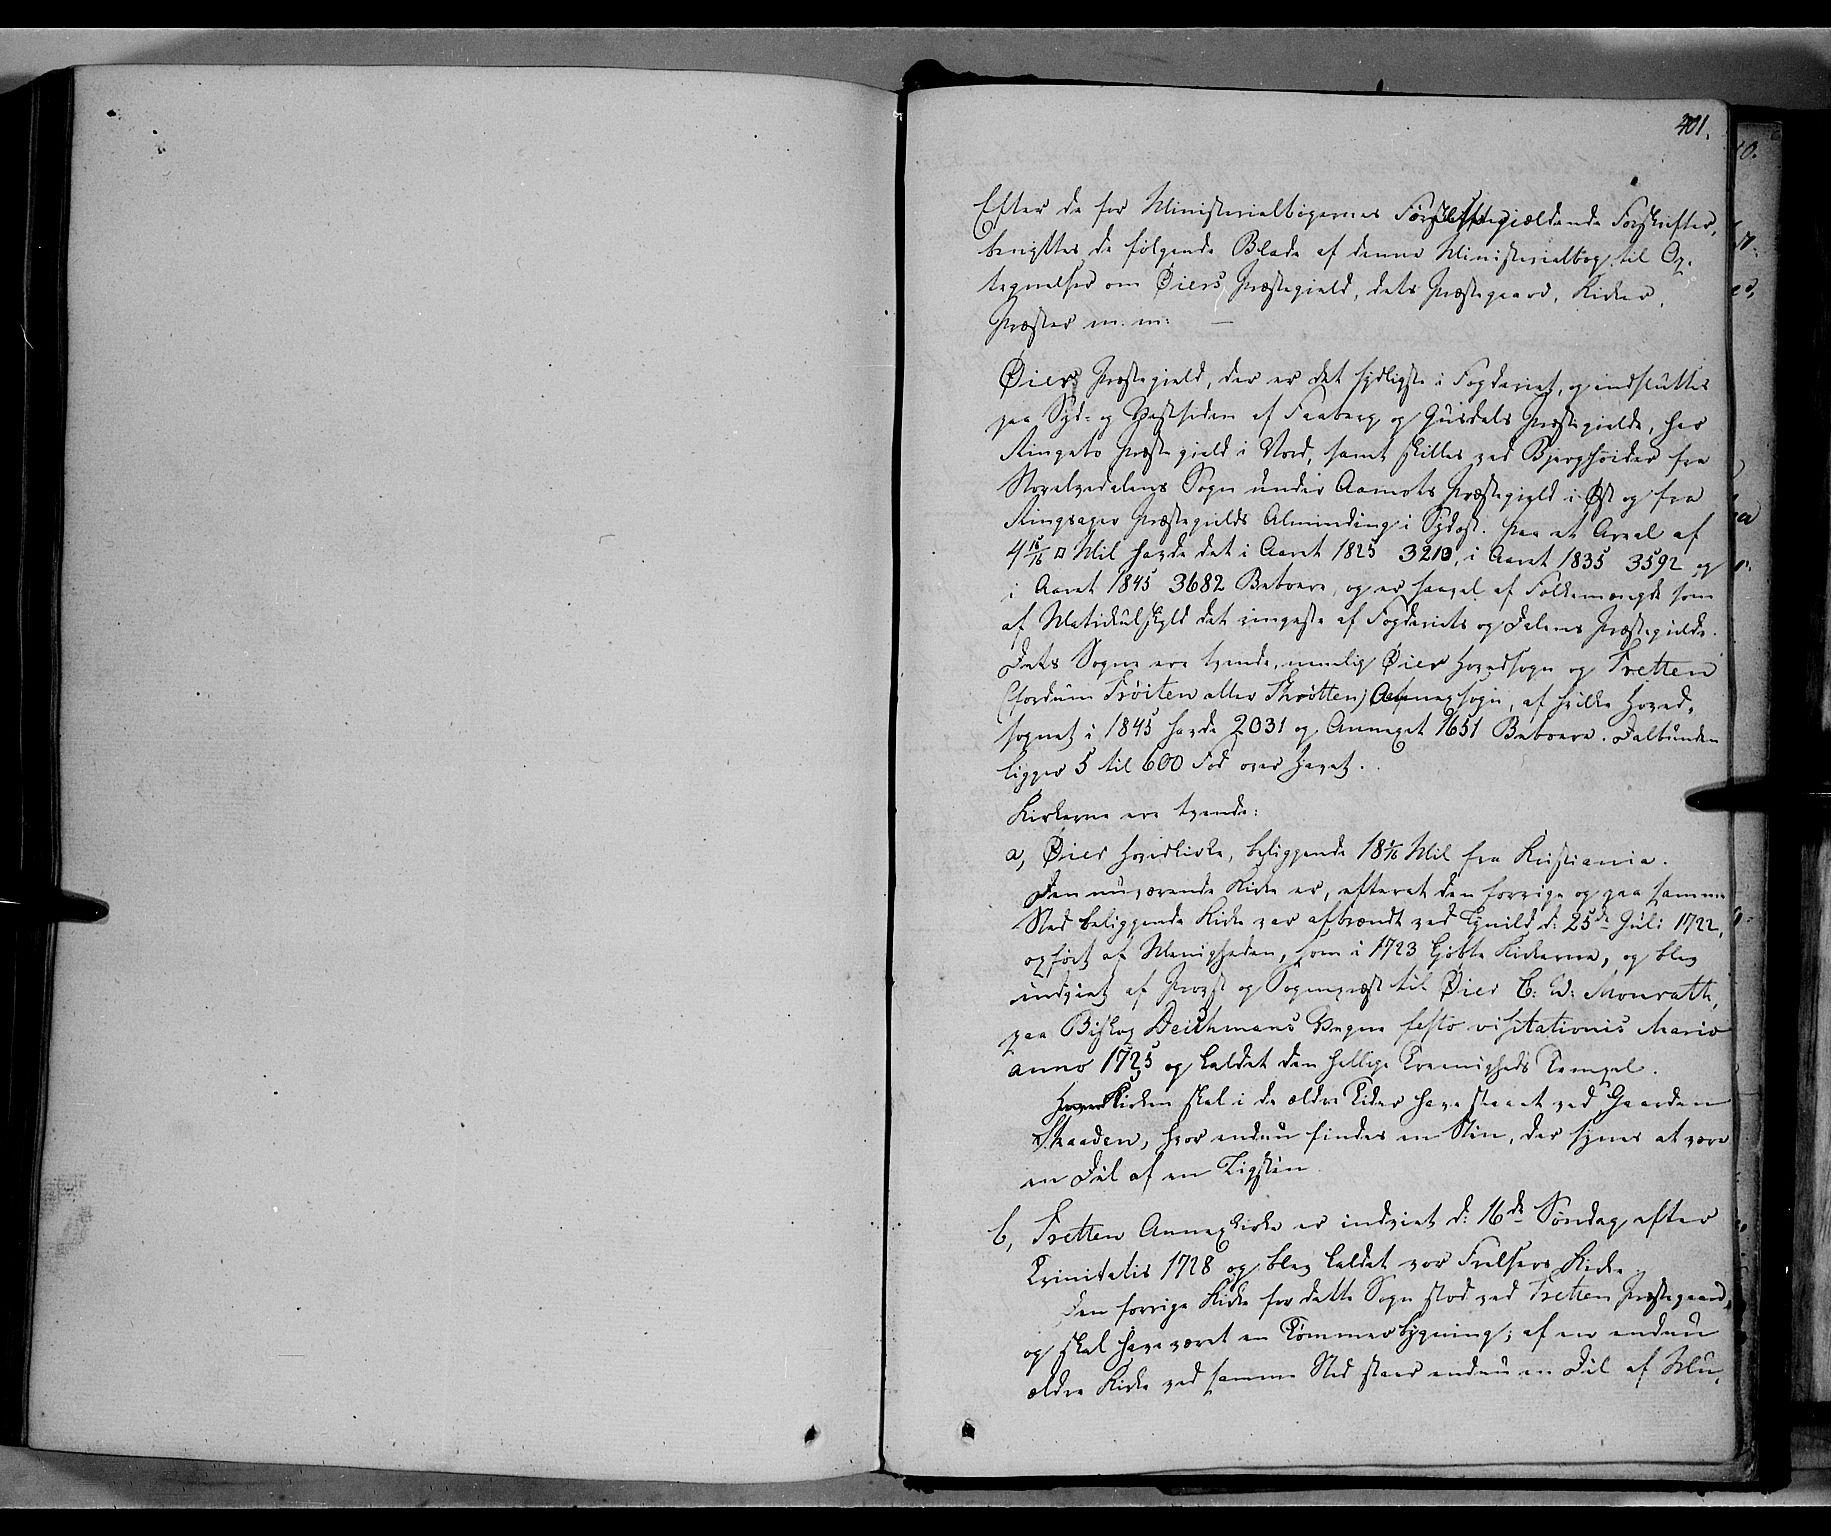 SAH, Øyer prestekontor, Ministerialbok nr. 5, 1842-1857, s. 401